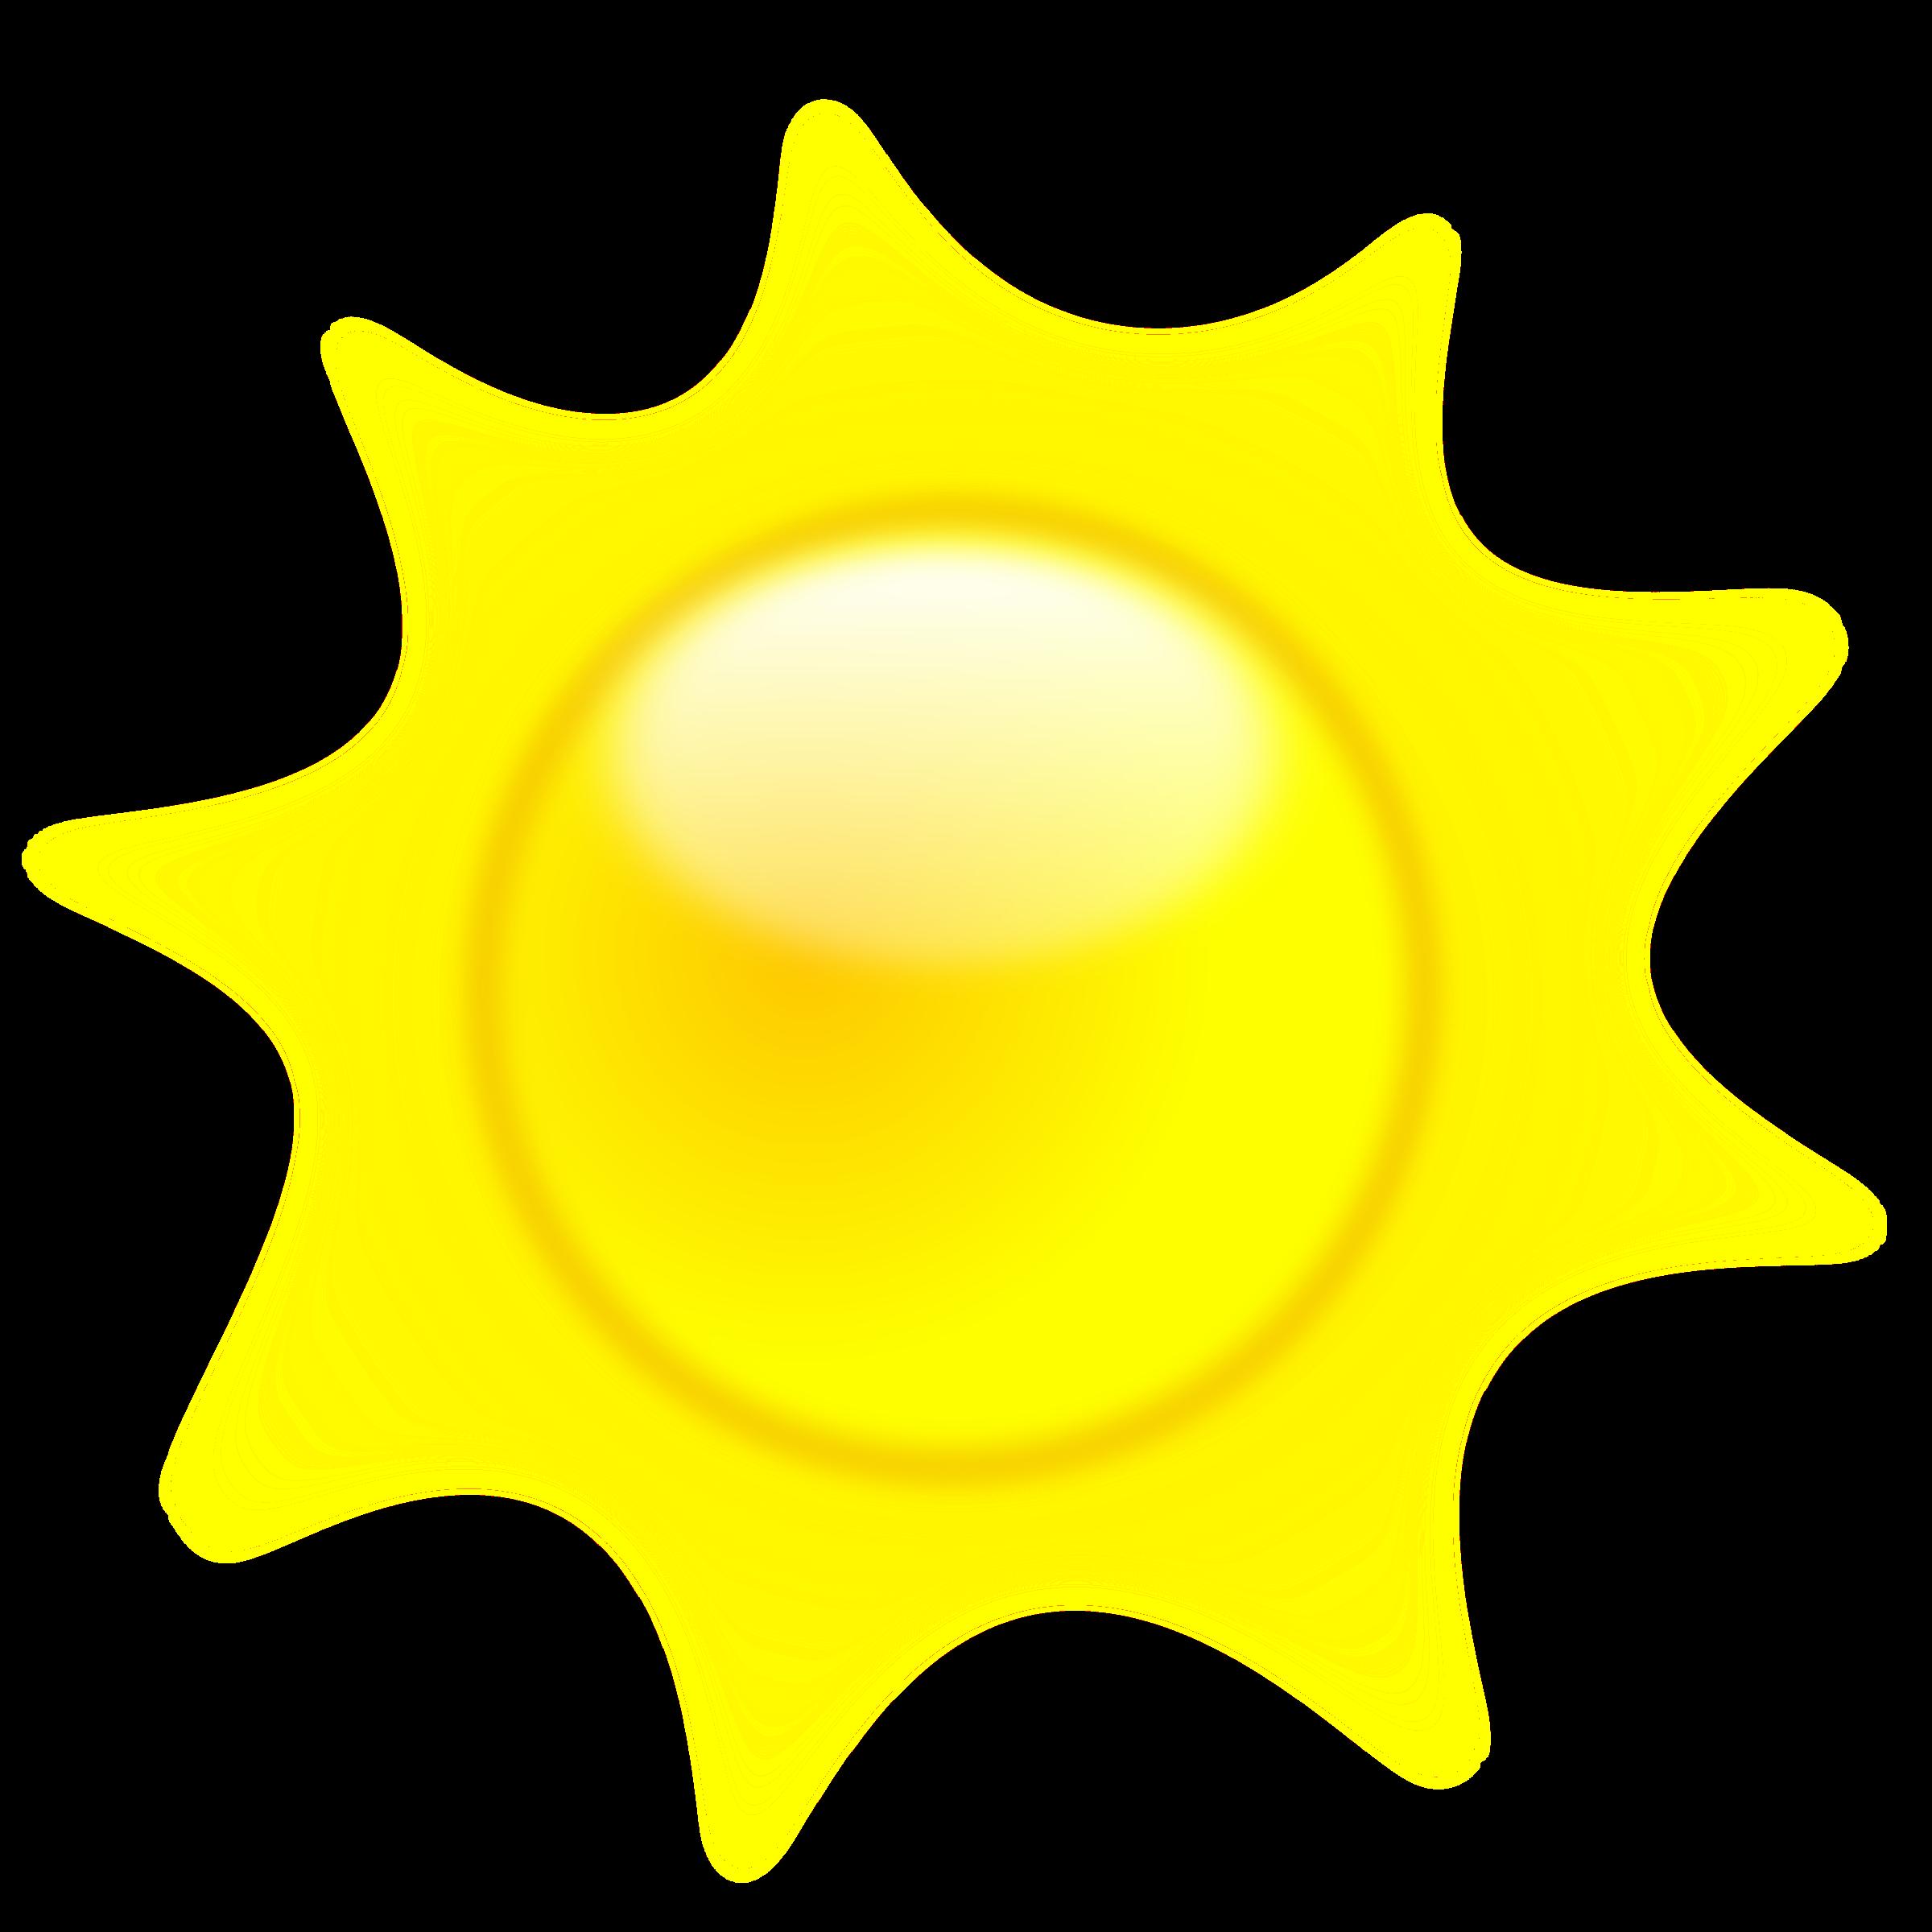 clipart sol sun rays clip art background sun rays clip art images